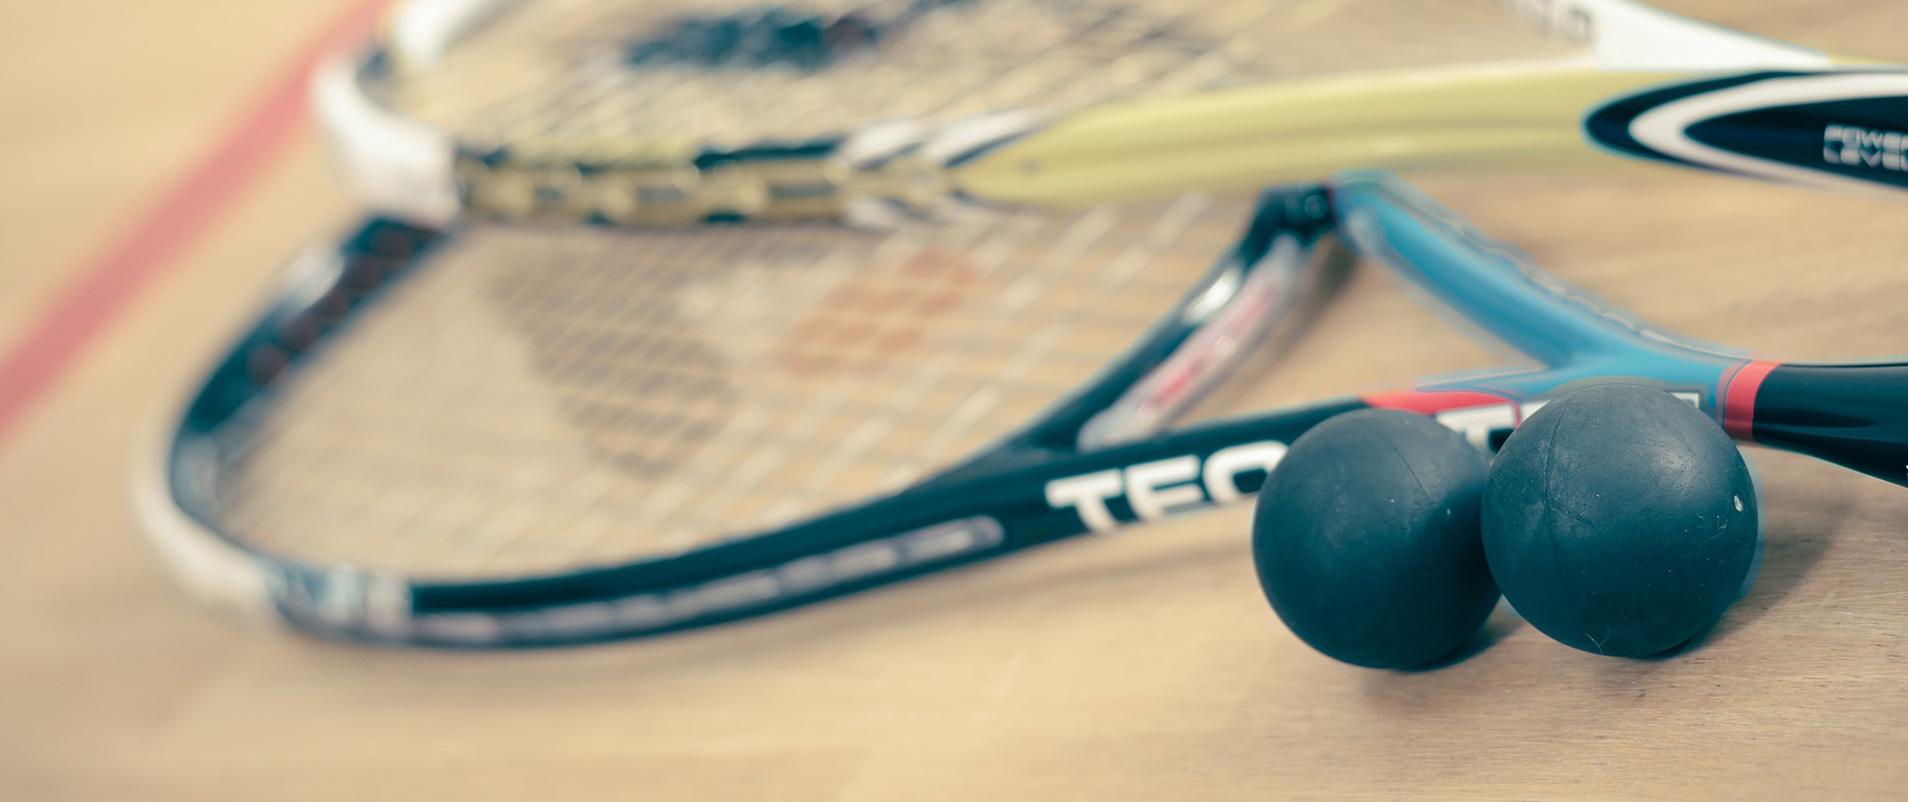 Squash and Racket Ball Beverley